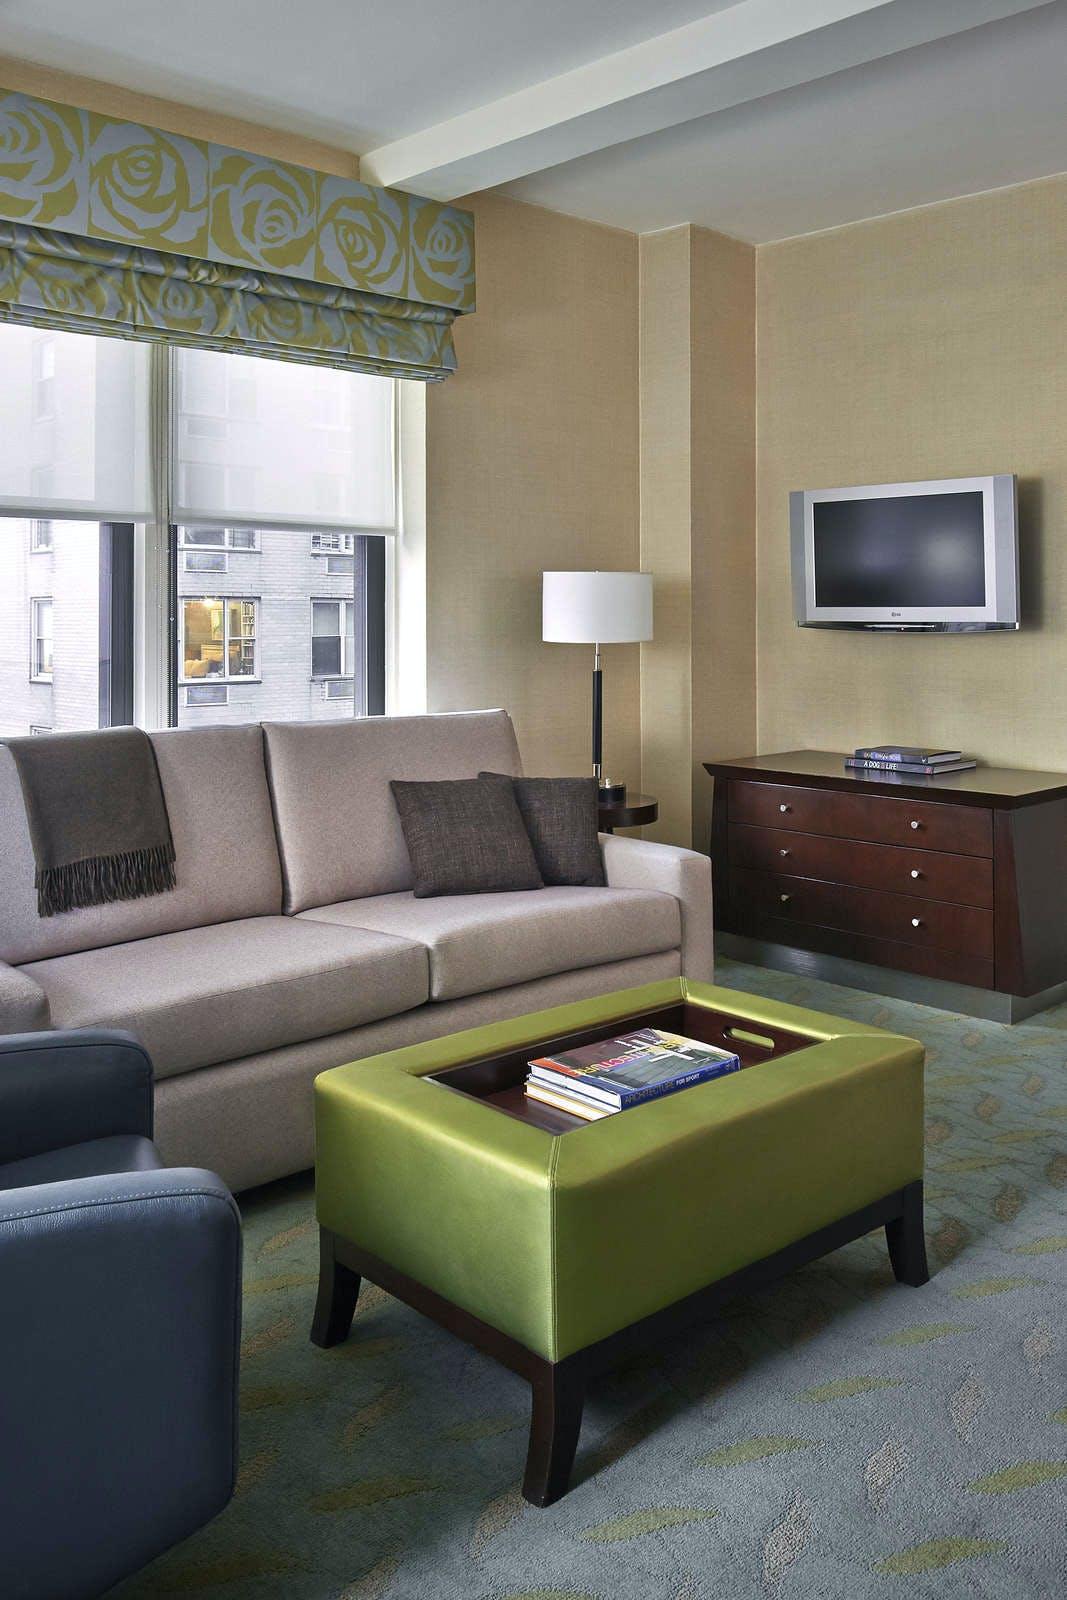 Shelburne Hotel & Suites by Affinia